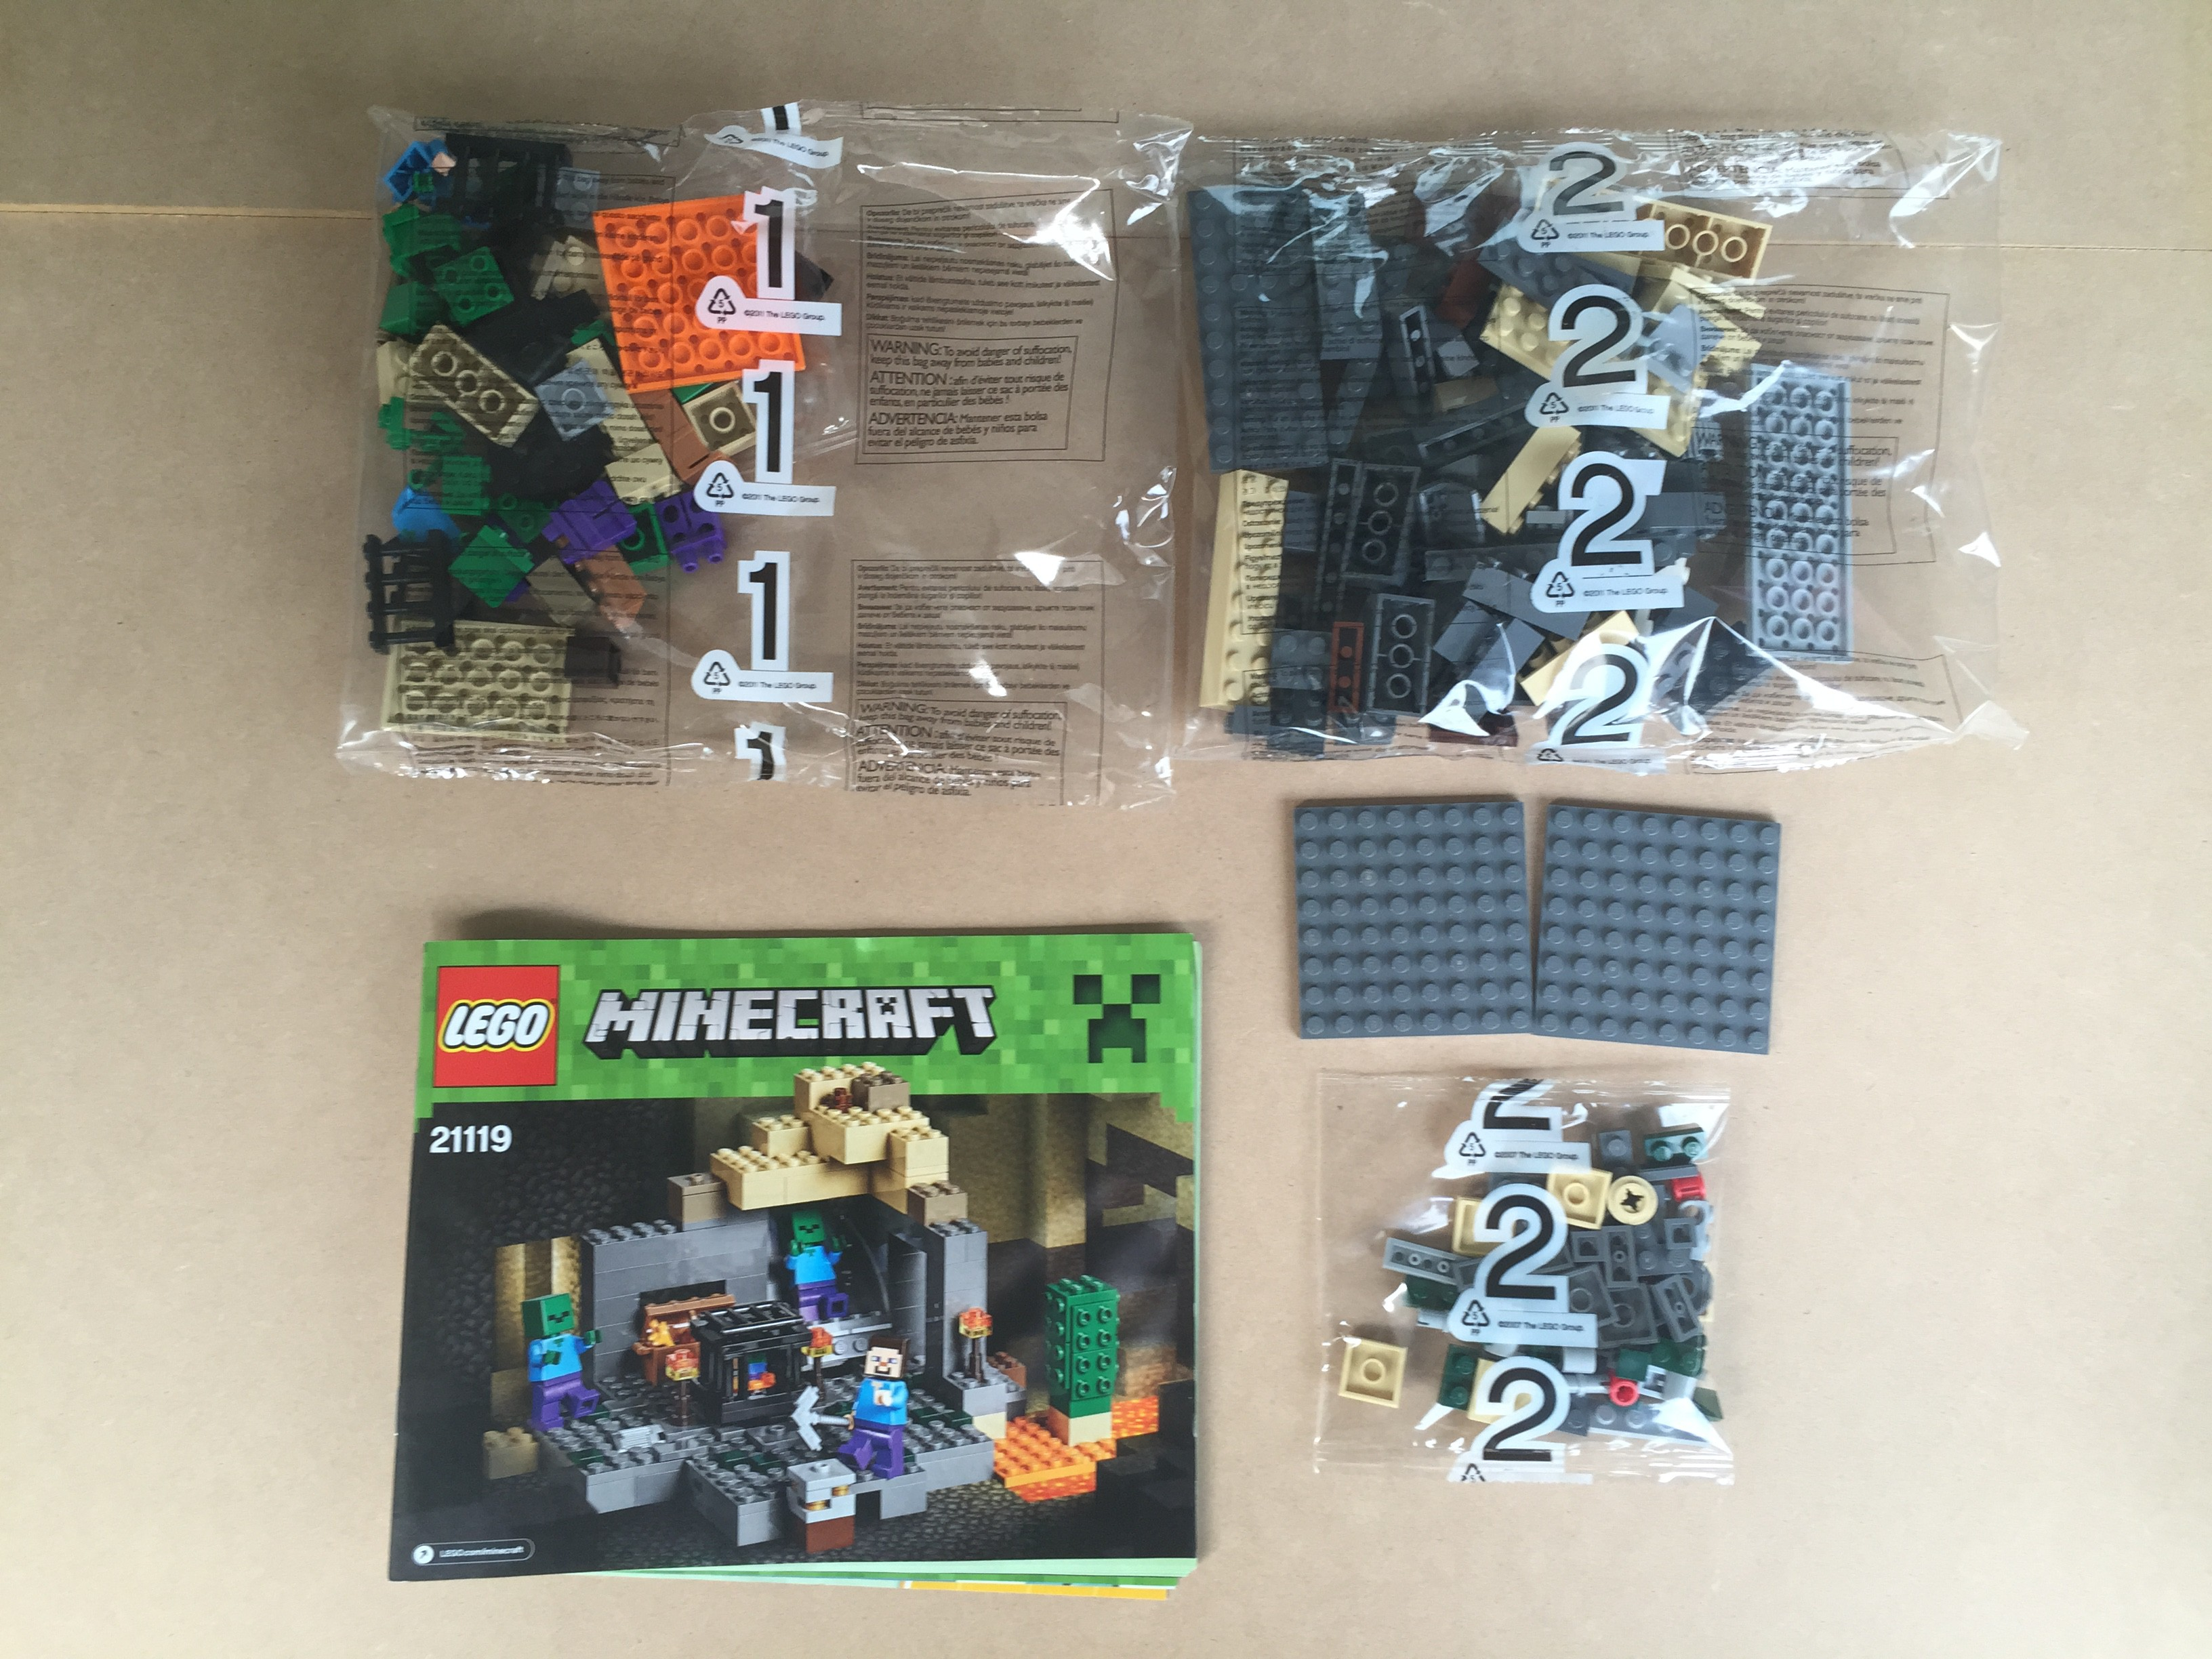 Review Lego Minecraft 2015 Siguen Las Aventuras De Steve